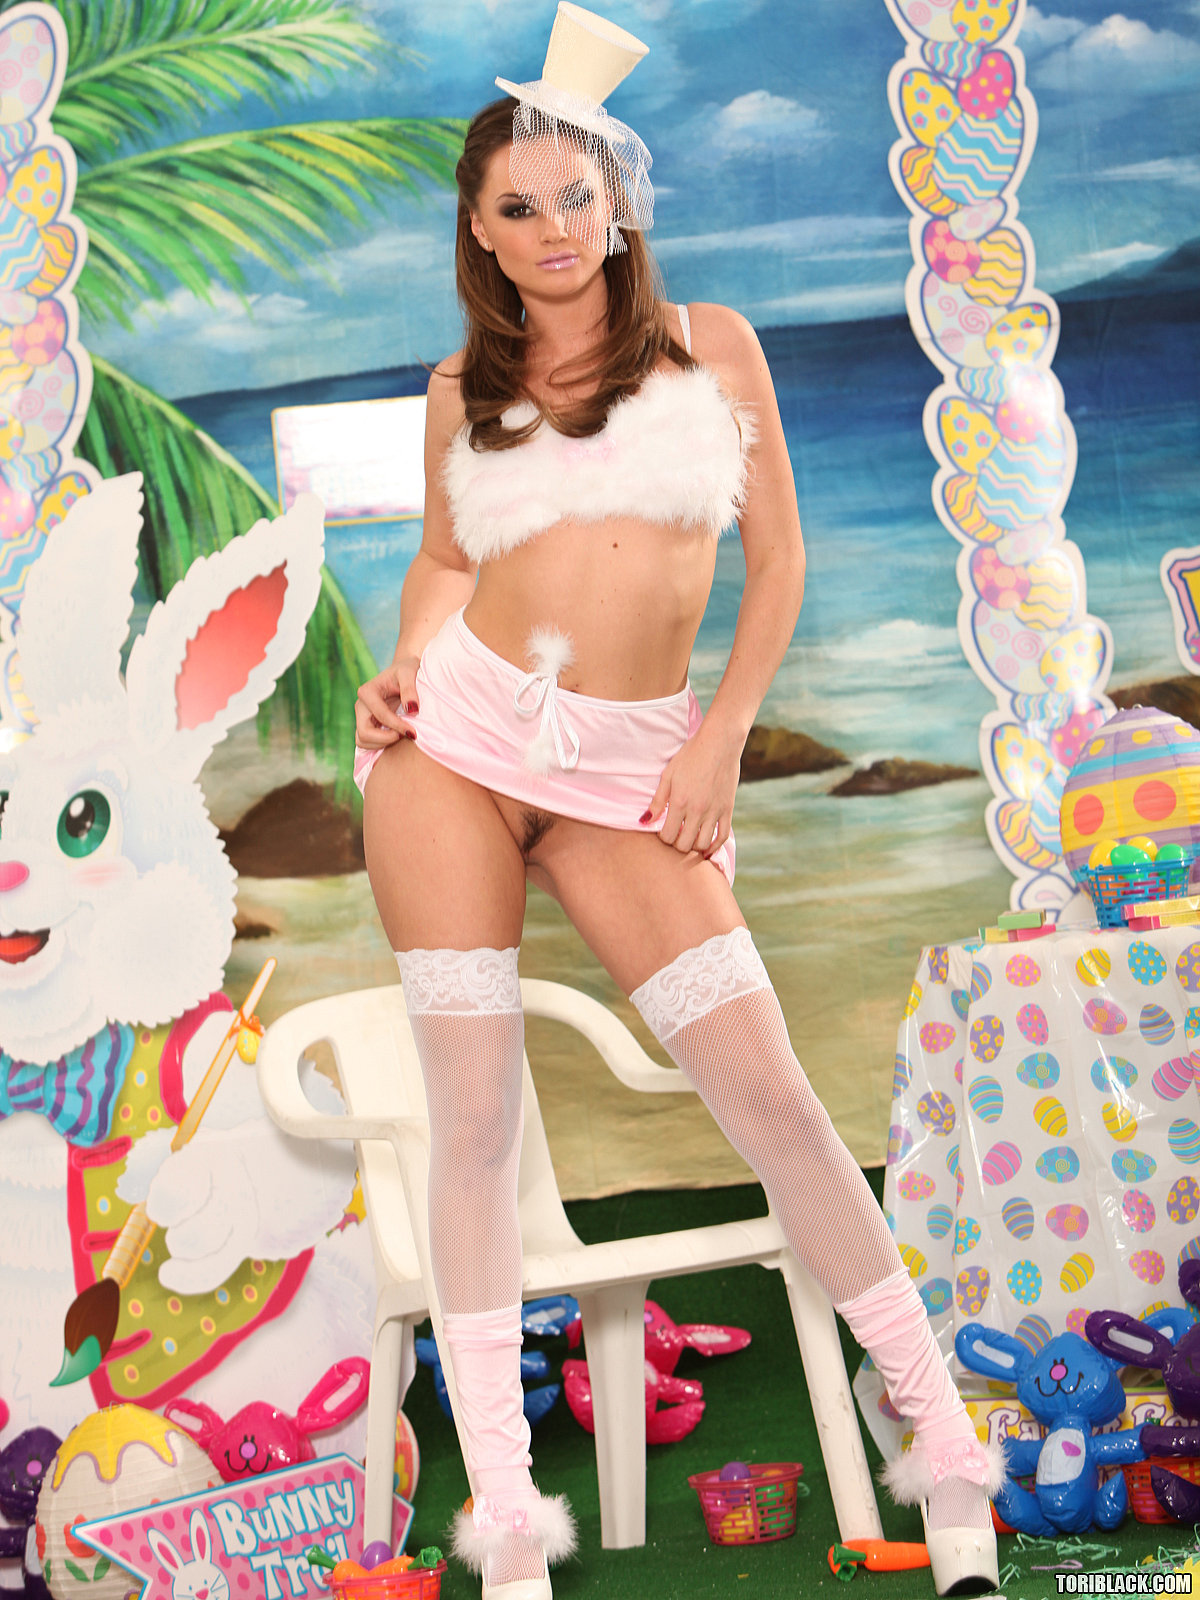 Tori Black Easter Basket Complete Full Size Picture Set   the yudis